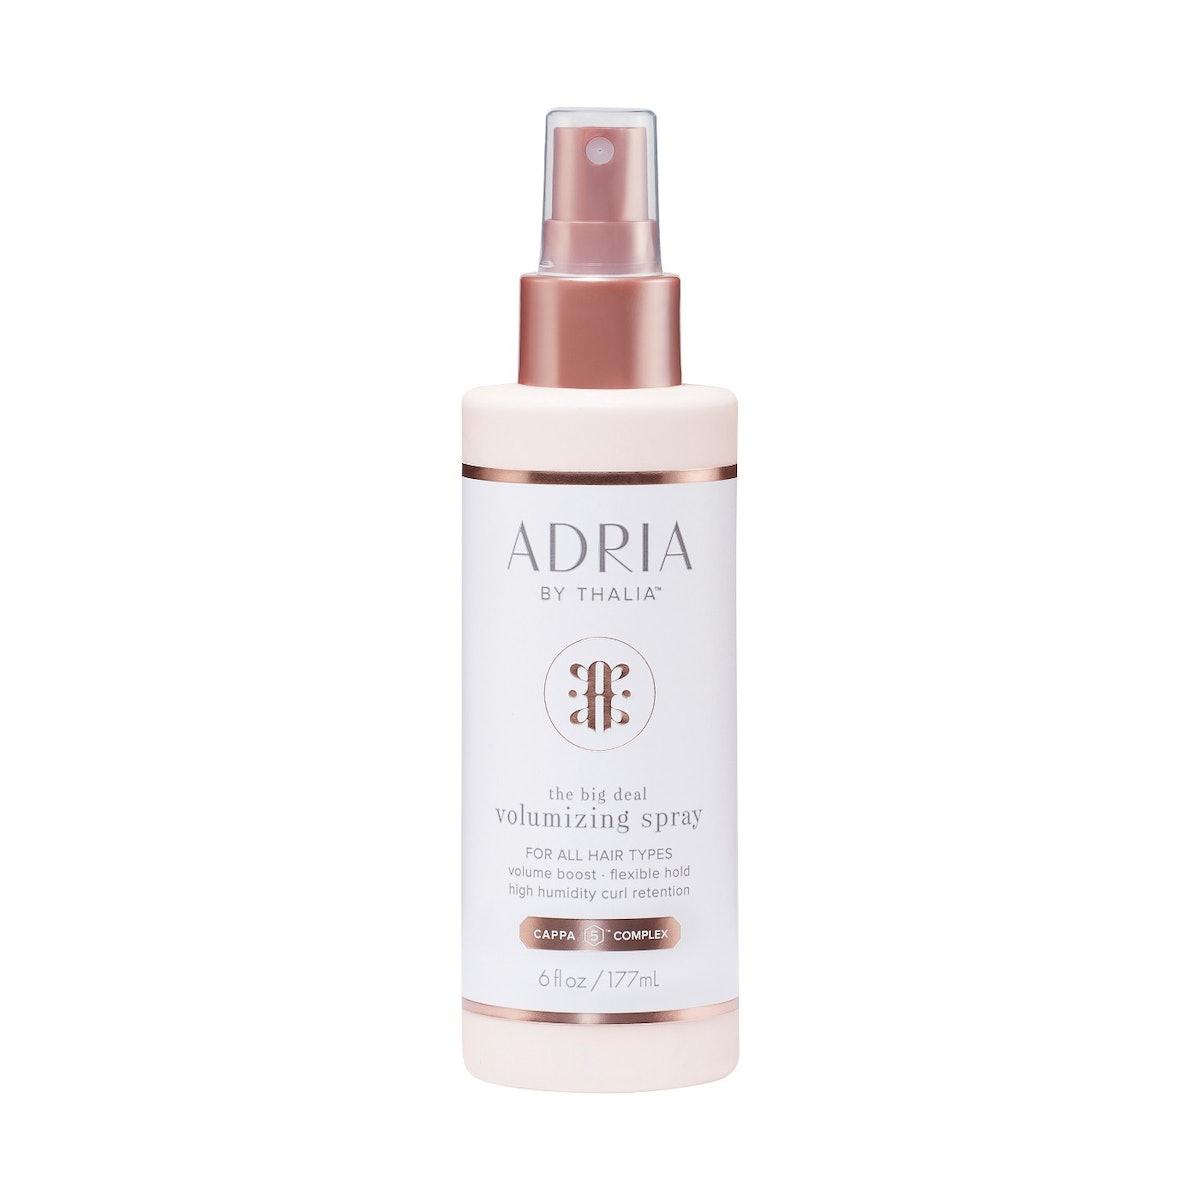 Adria By Thalia The Big Deal Volumizing Spray